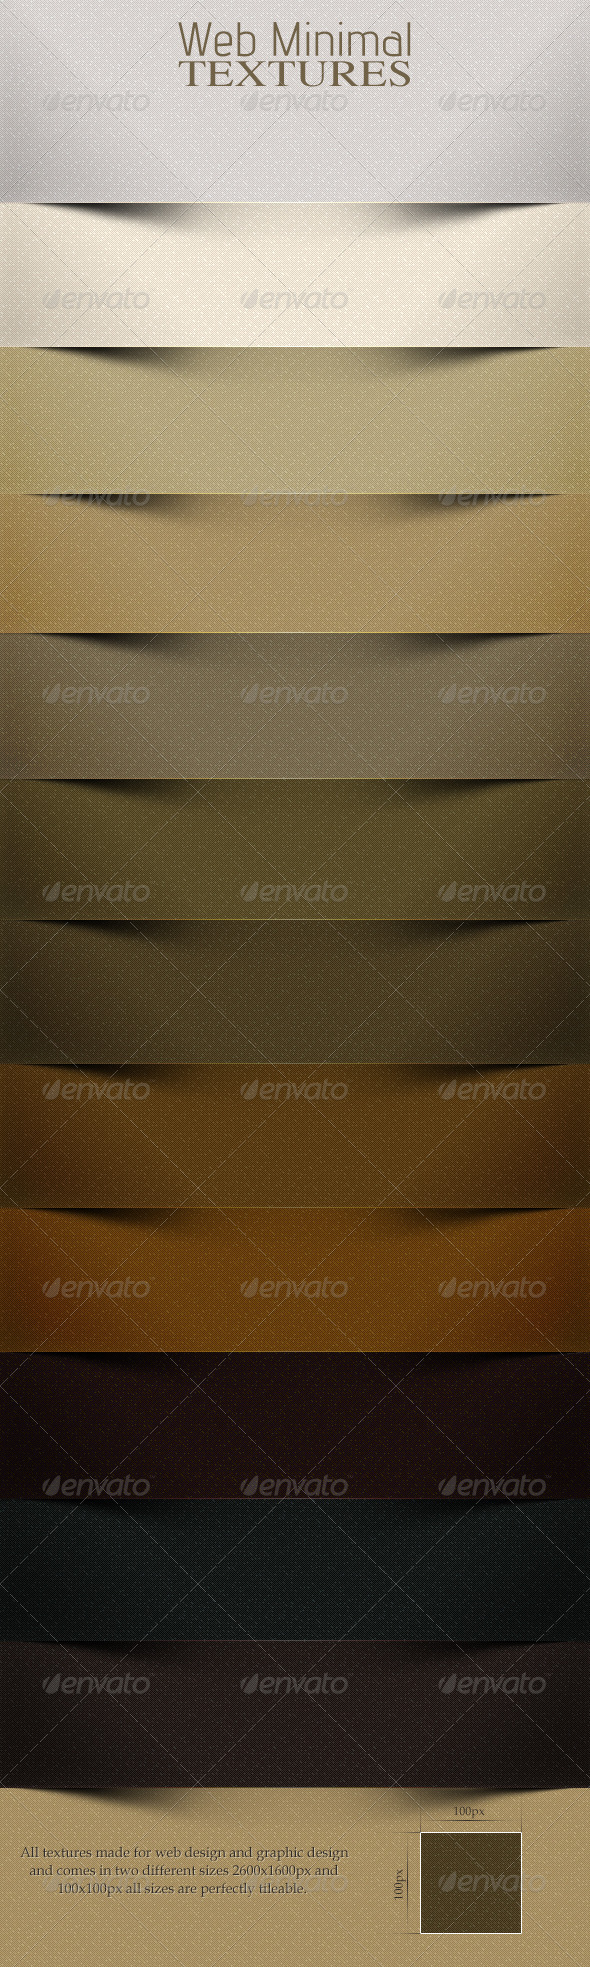 GraphicRiver Minimal Textures 3.0 3435722